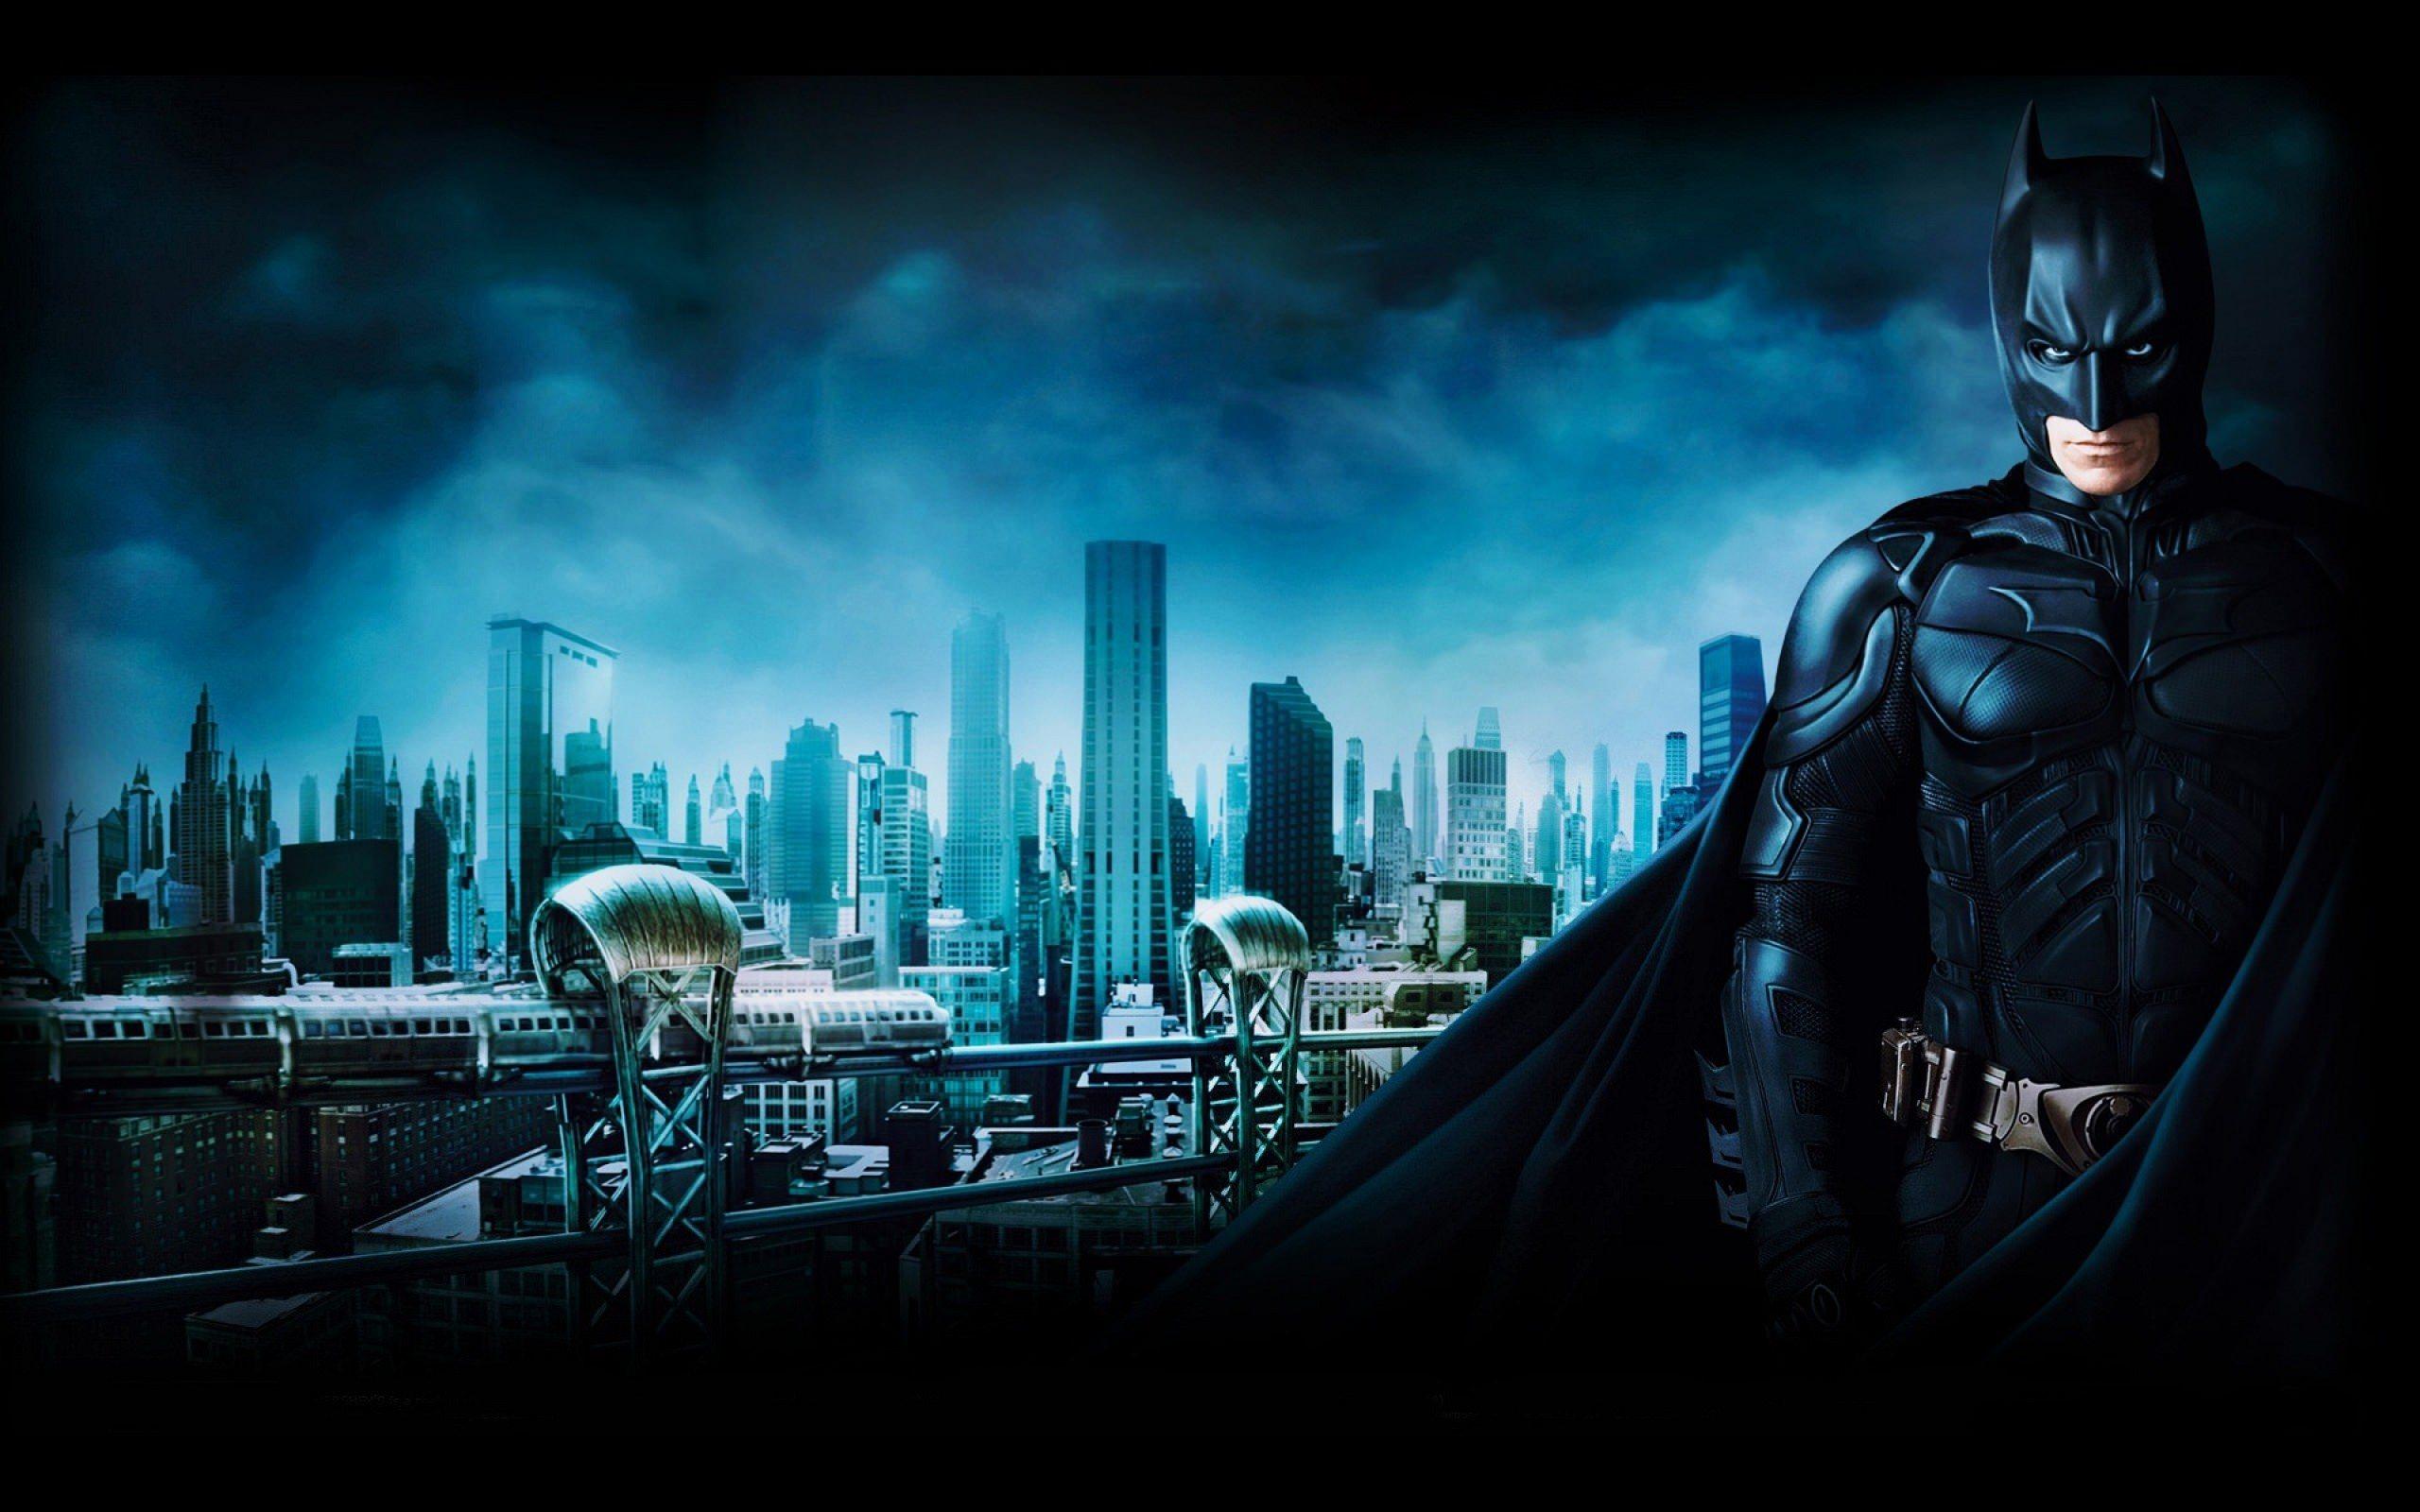 15 Best HD Superhero Movie WallpapersFreeCreatives 2560x1600